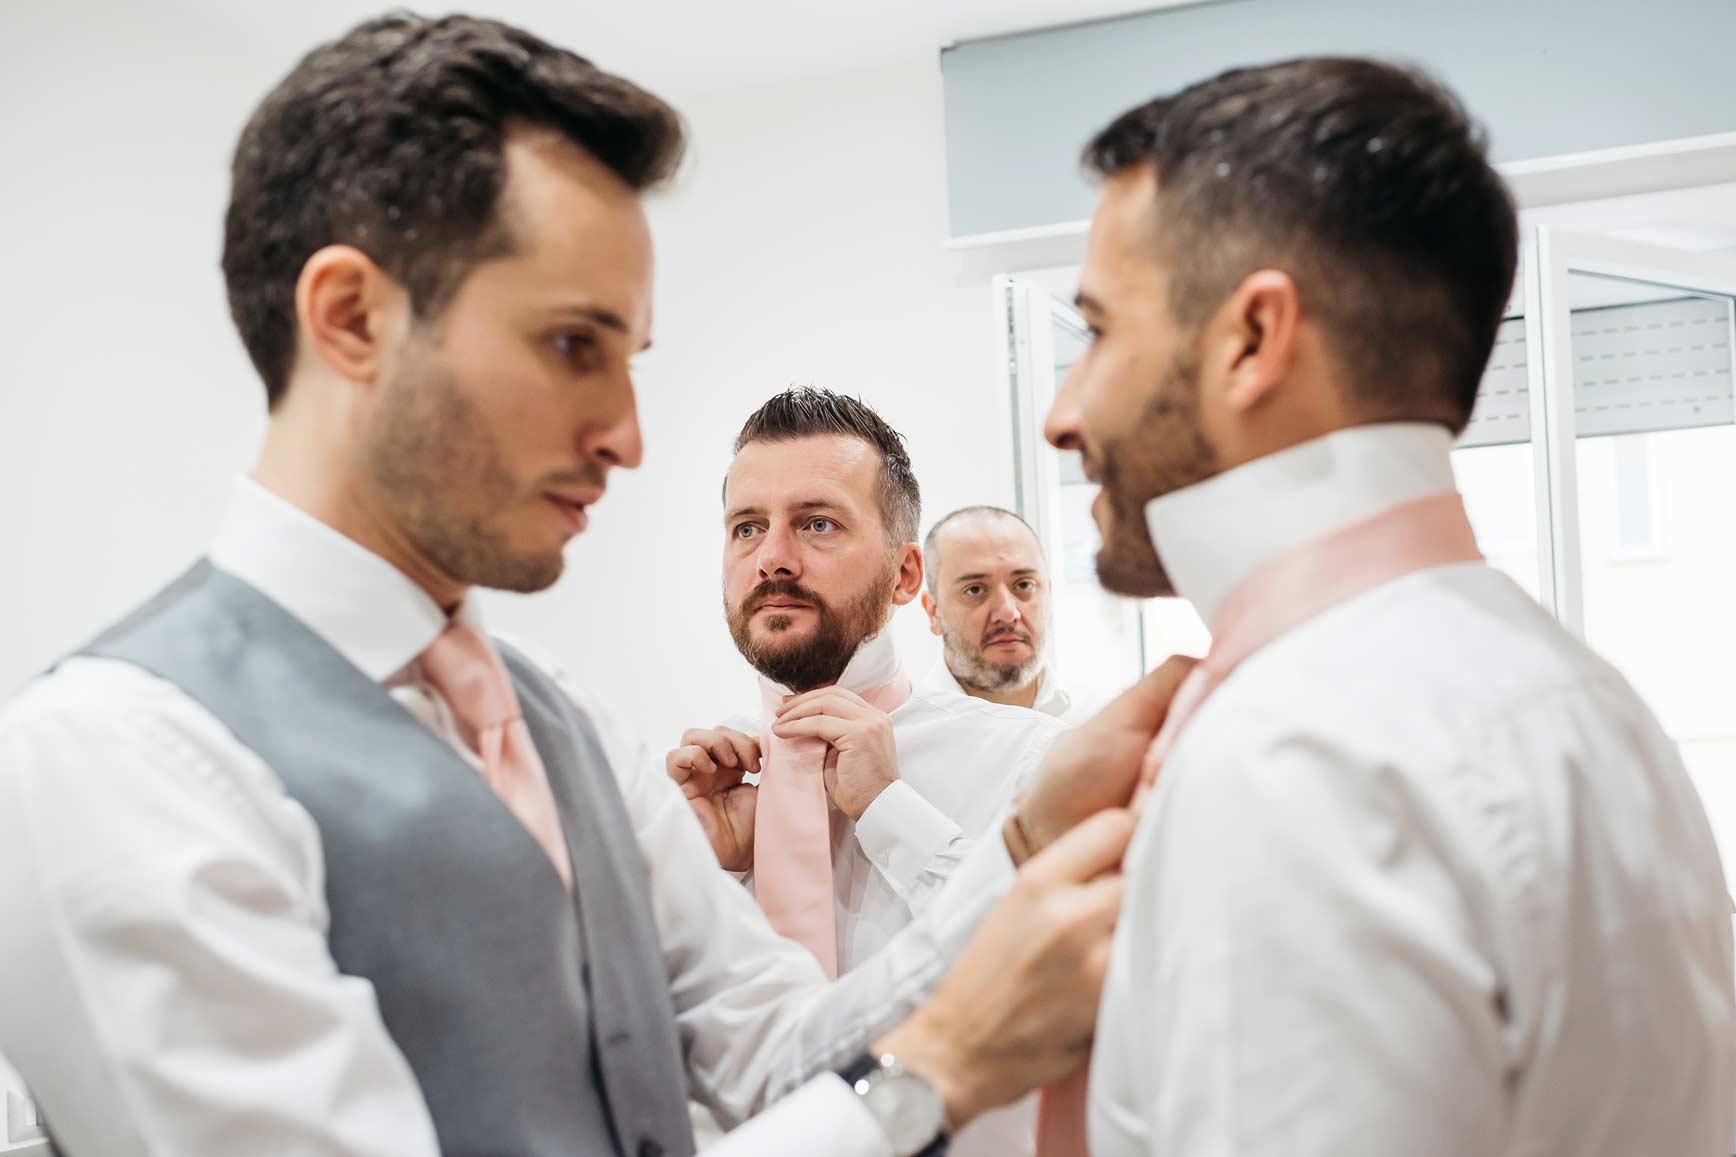 Wedding-Photographer-in-Italy-Groom